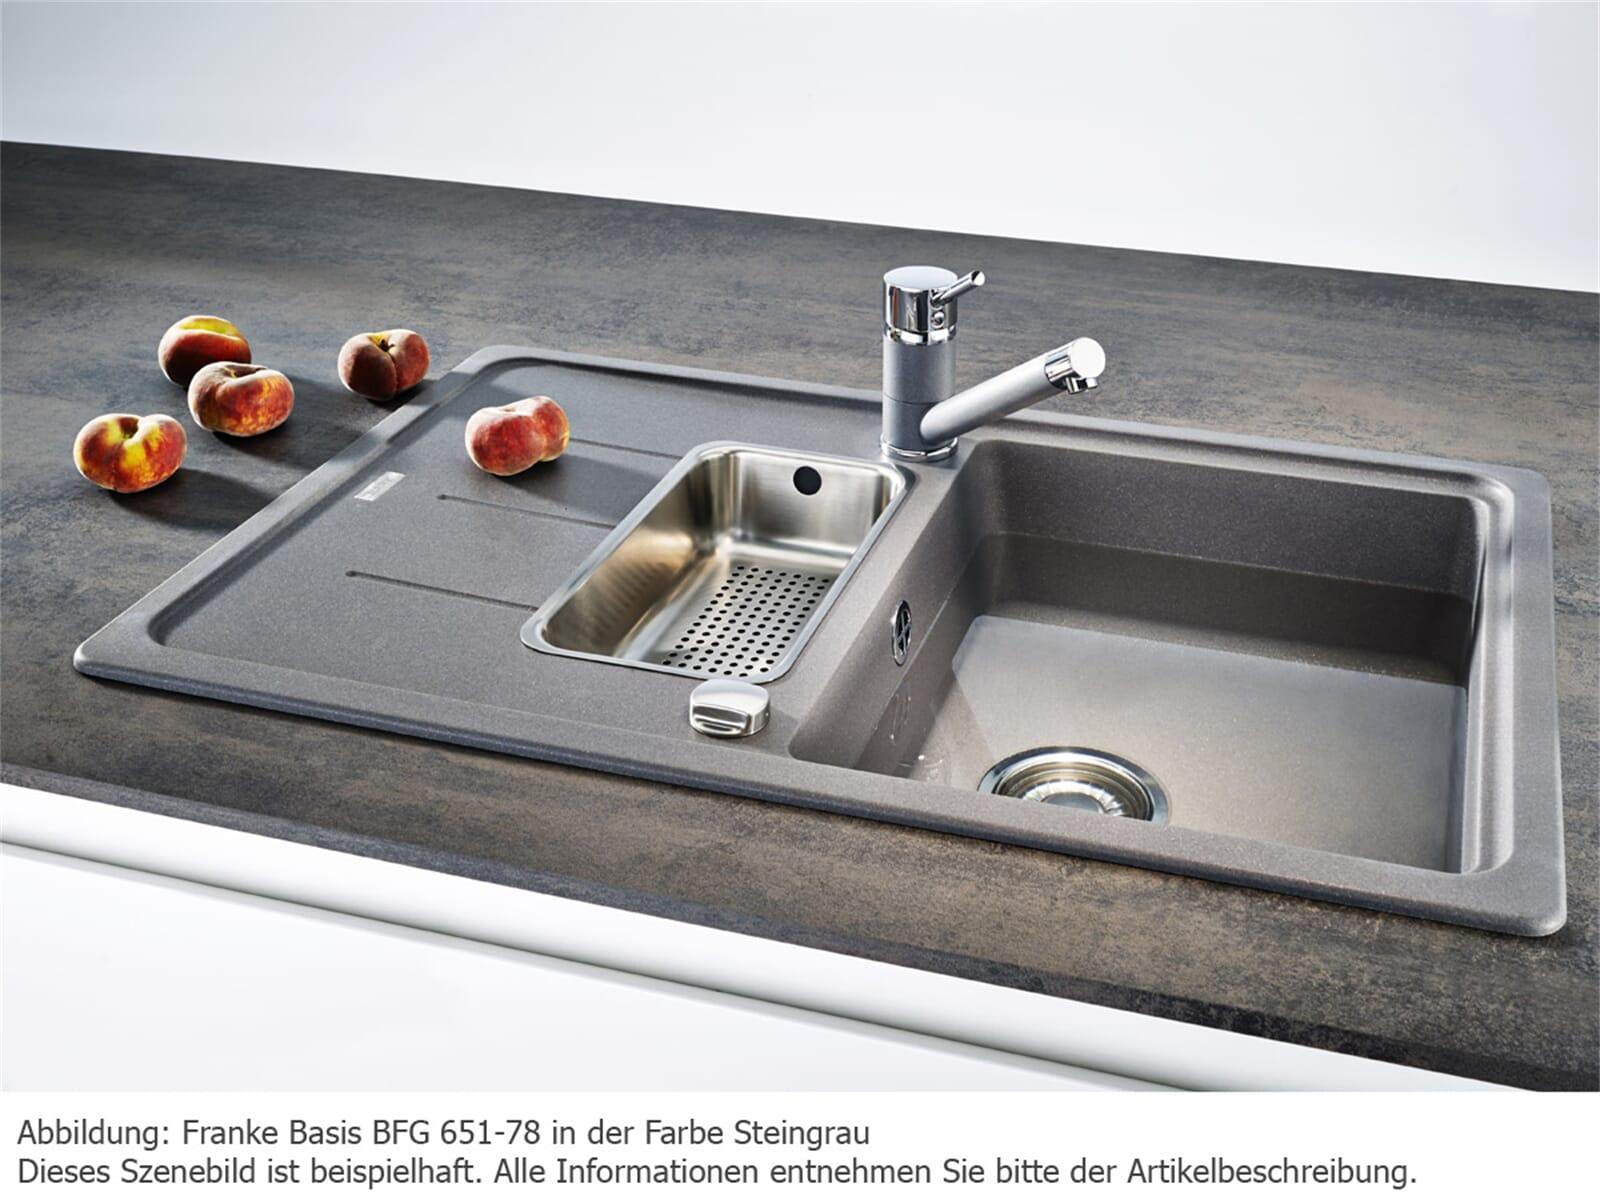 Franke Basis BFG 651-78 Steingrau Granitspüle